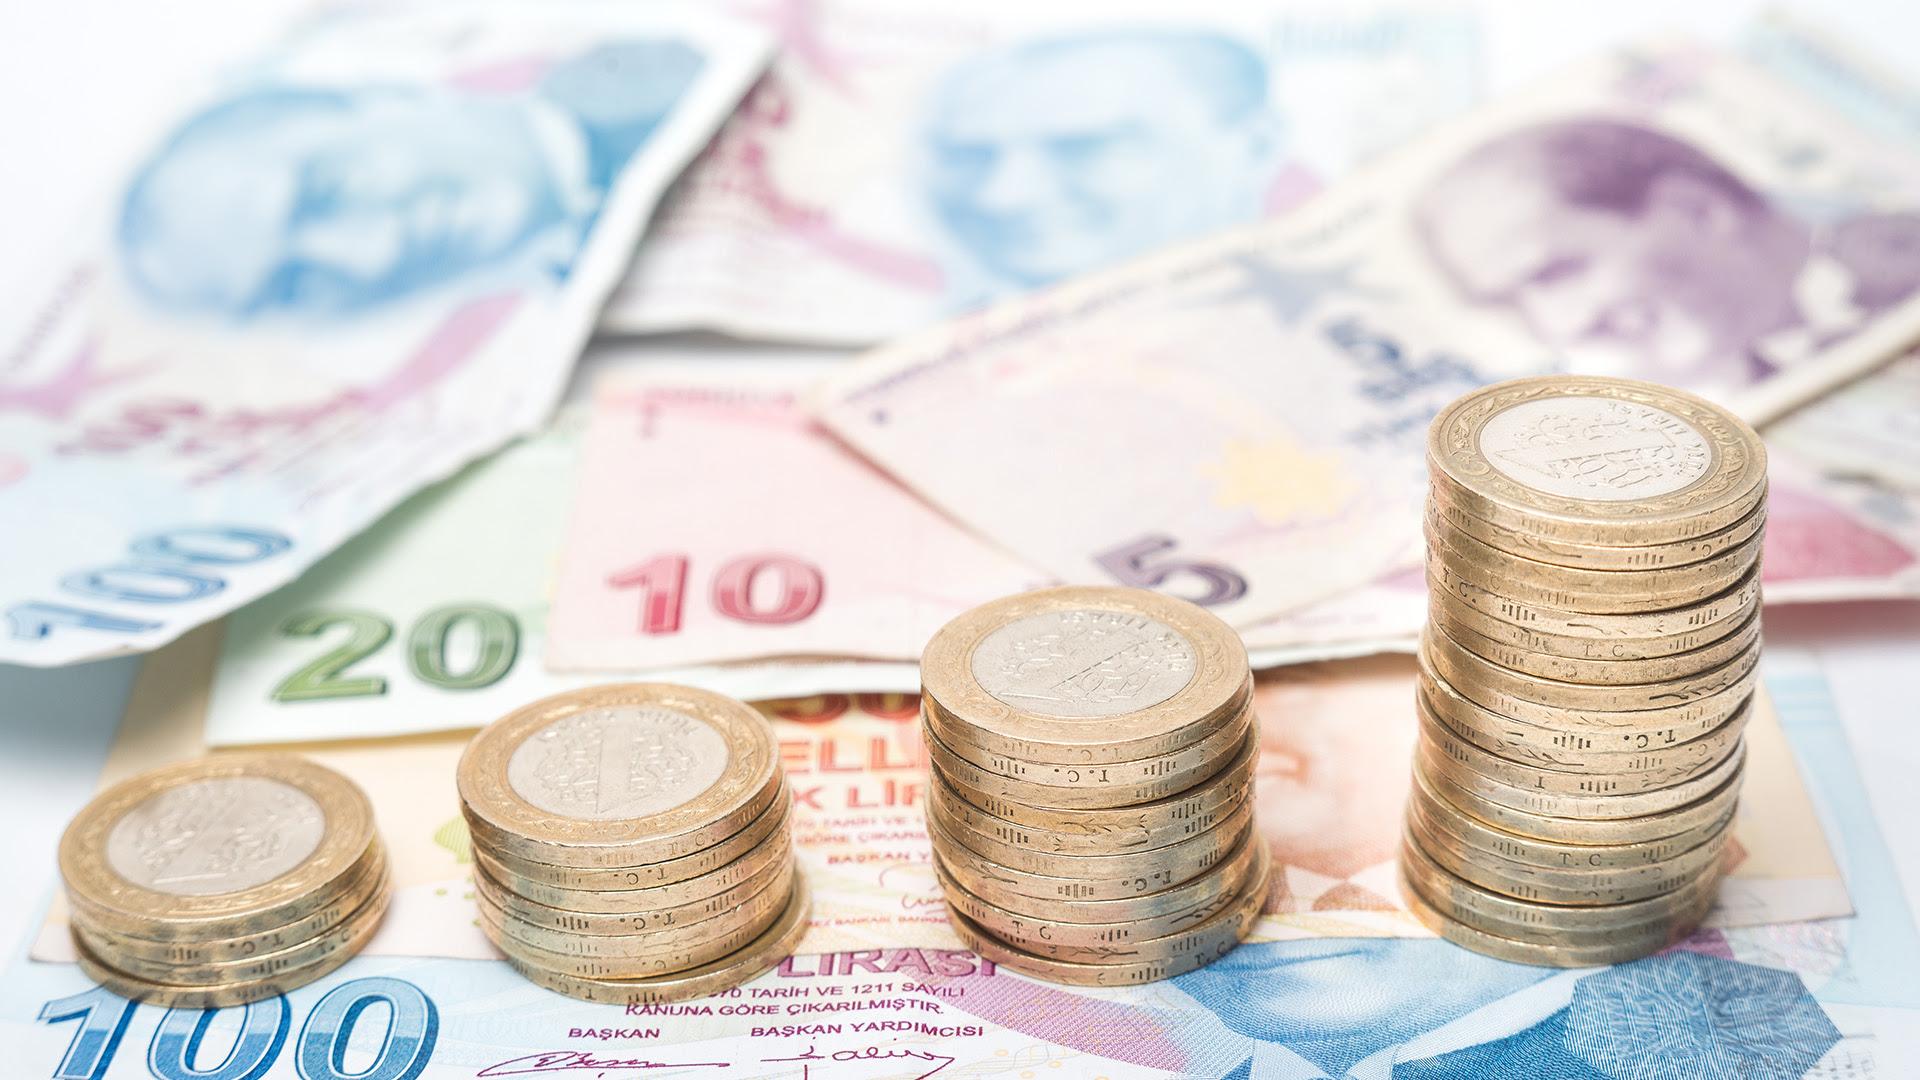 Currency Exchange in noida sector 18 | best exchange rate in noida | forex services in noida